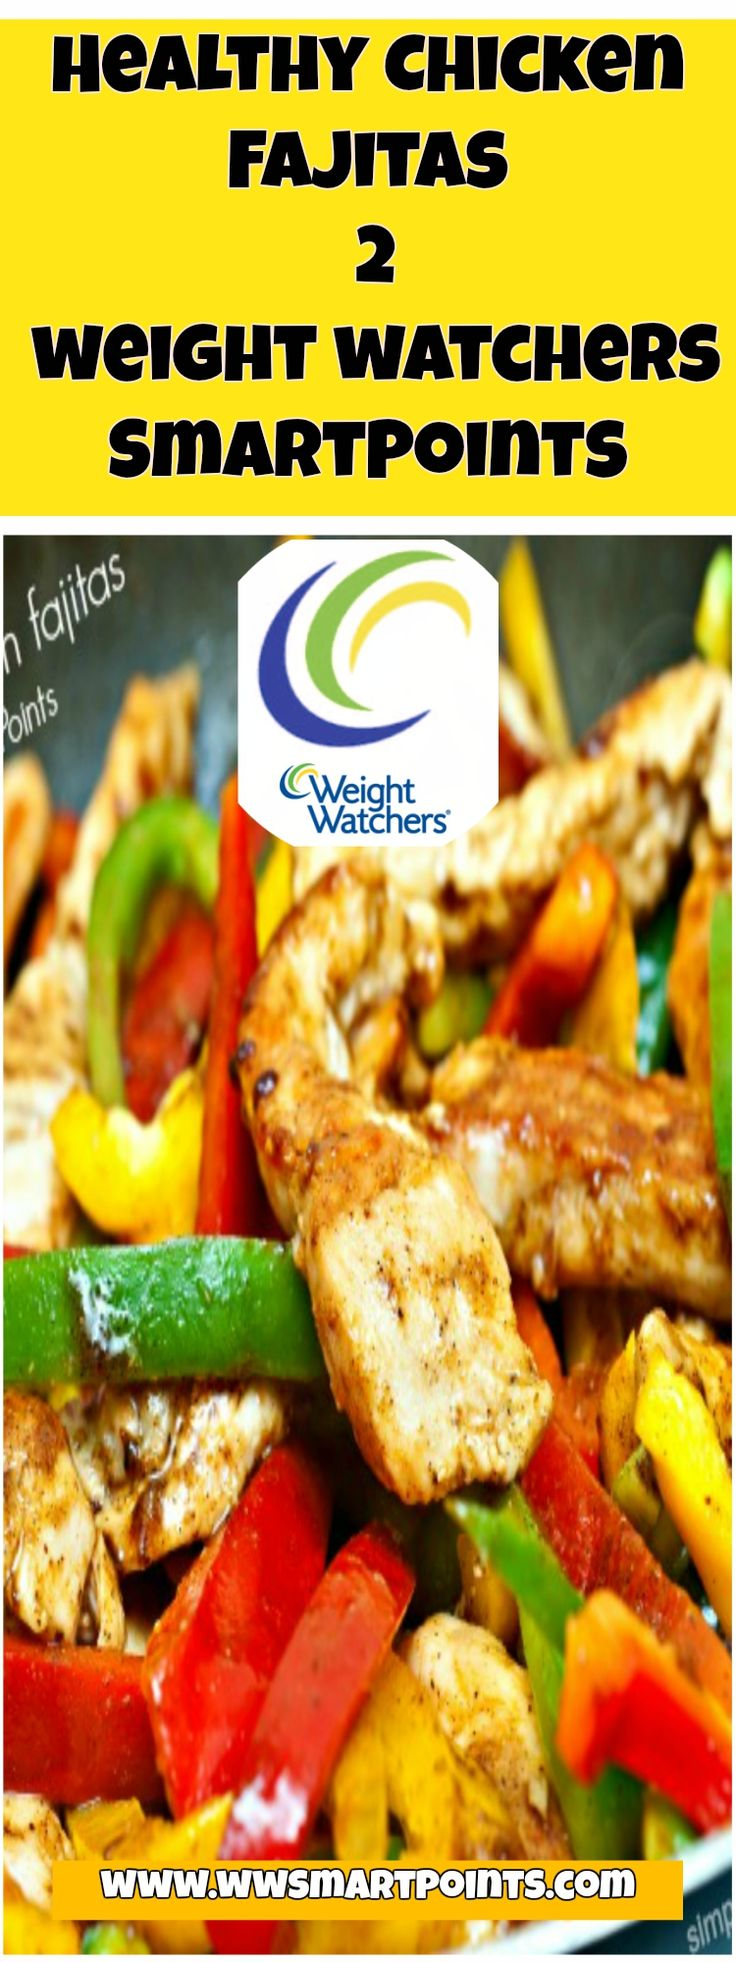 Healthy Chicken Fajitas – 2 weight watchers SmartPoints